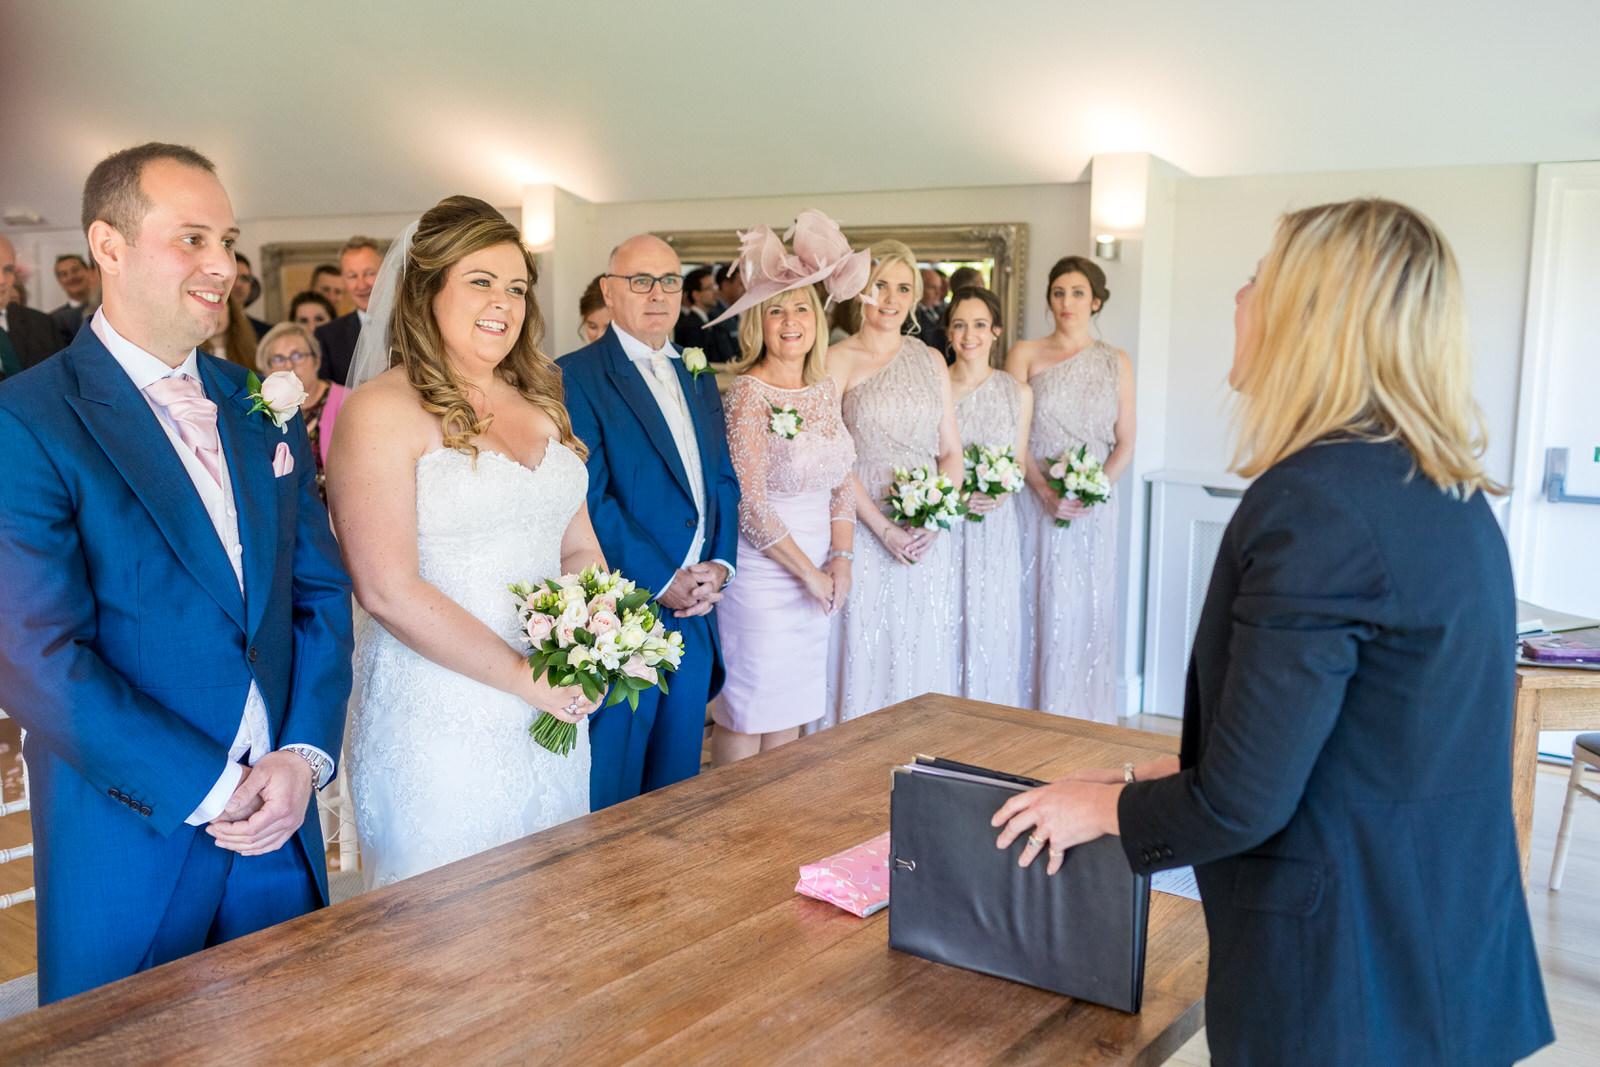 Home counties wedding photography by Damion Mower on English-Wedding.com (4)